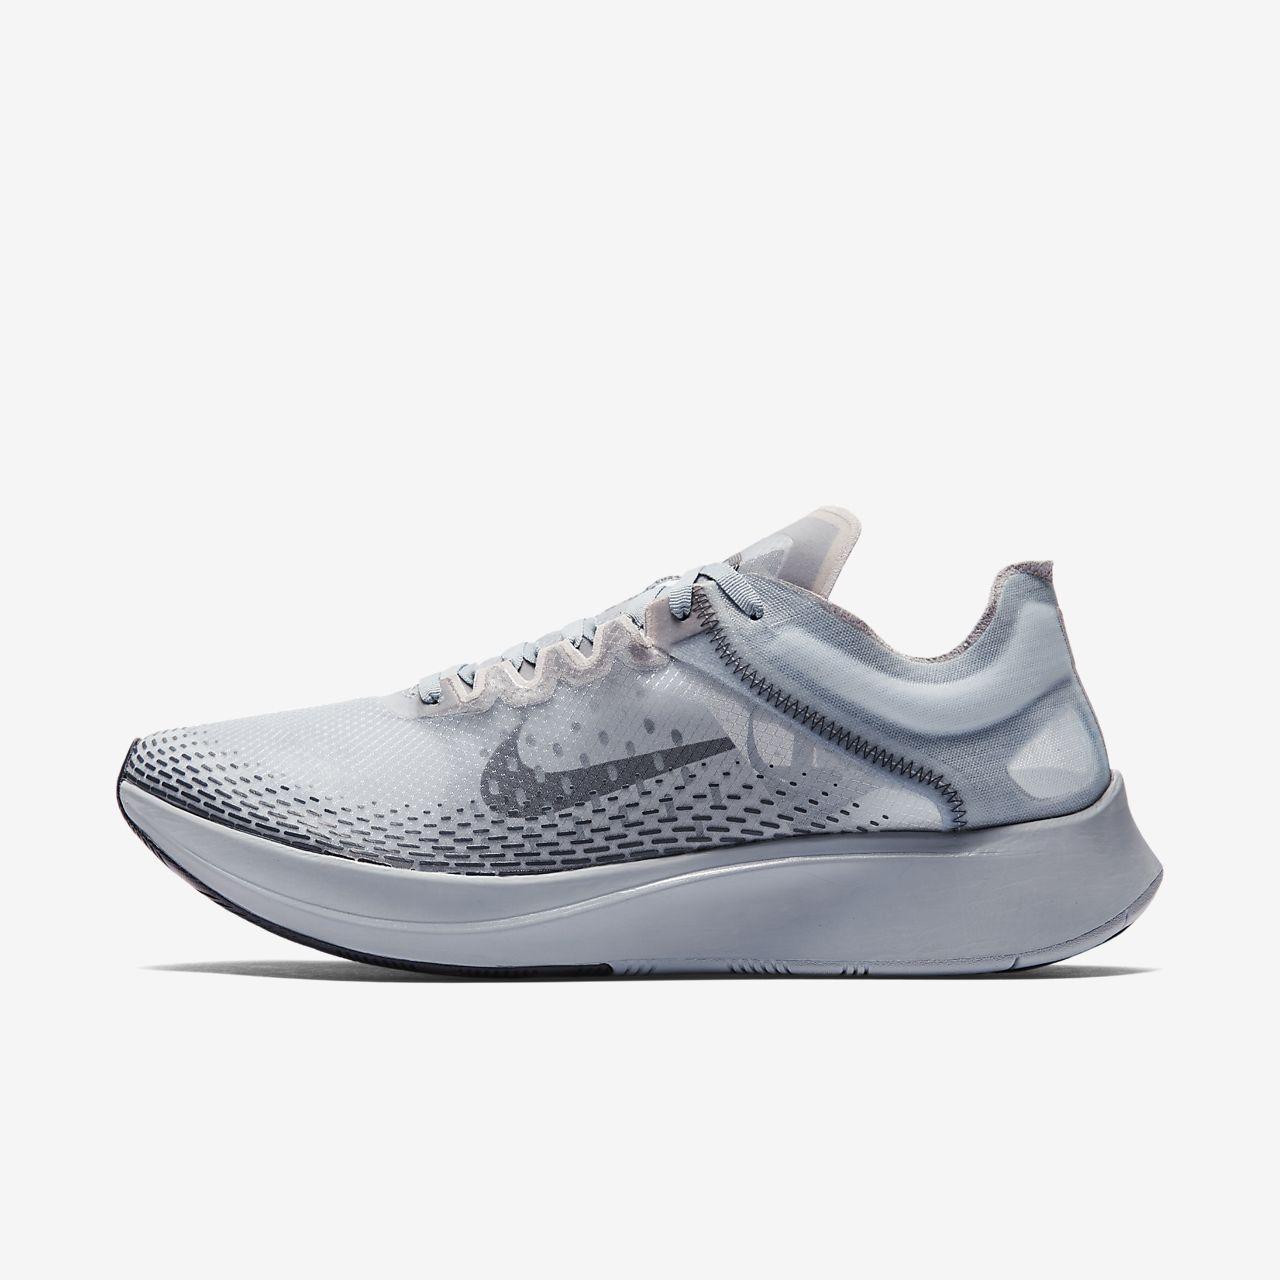 46df3b683 Scarpa da running Nike Zoom Fly SP Fast. Nike.com IT